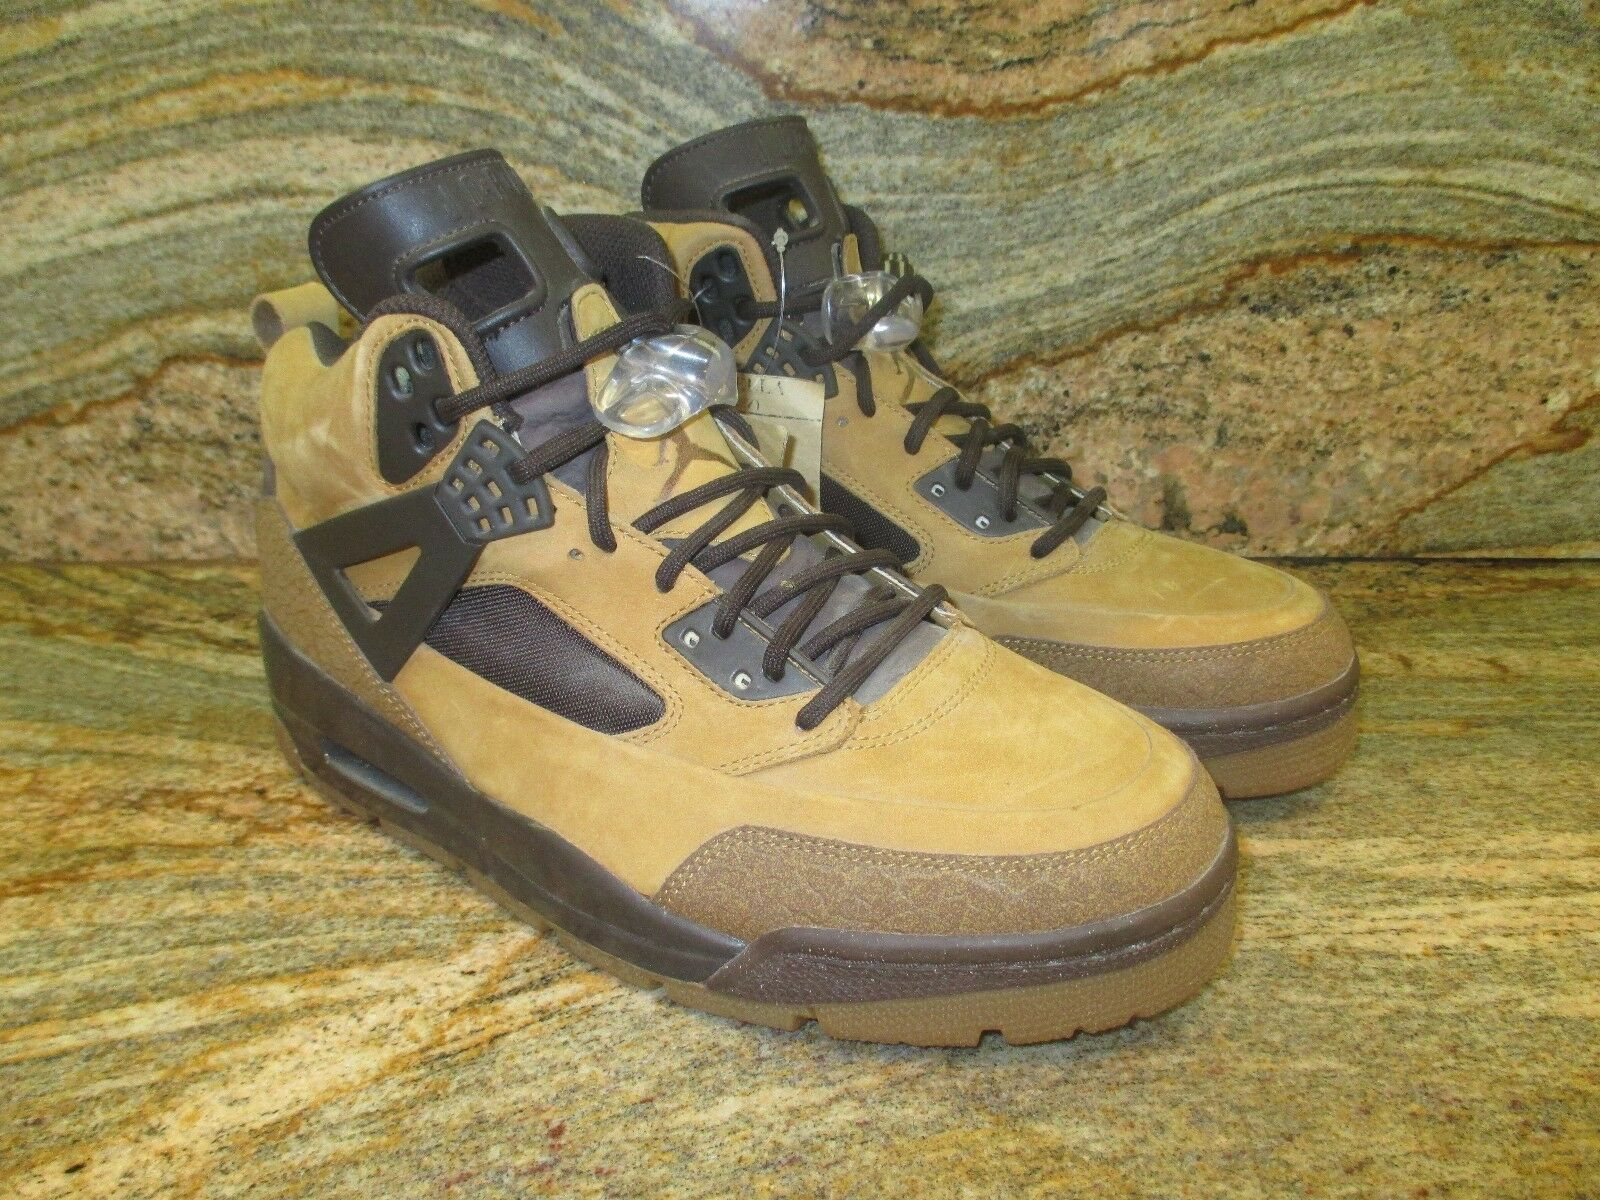 Unreleased Nike Air Jordan Spizike Sample Boot Sample Spizike SZ 9 Wheat Flax Retro PE Promo OG 585865